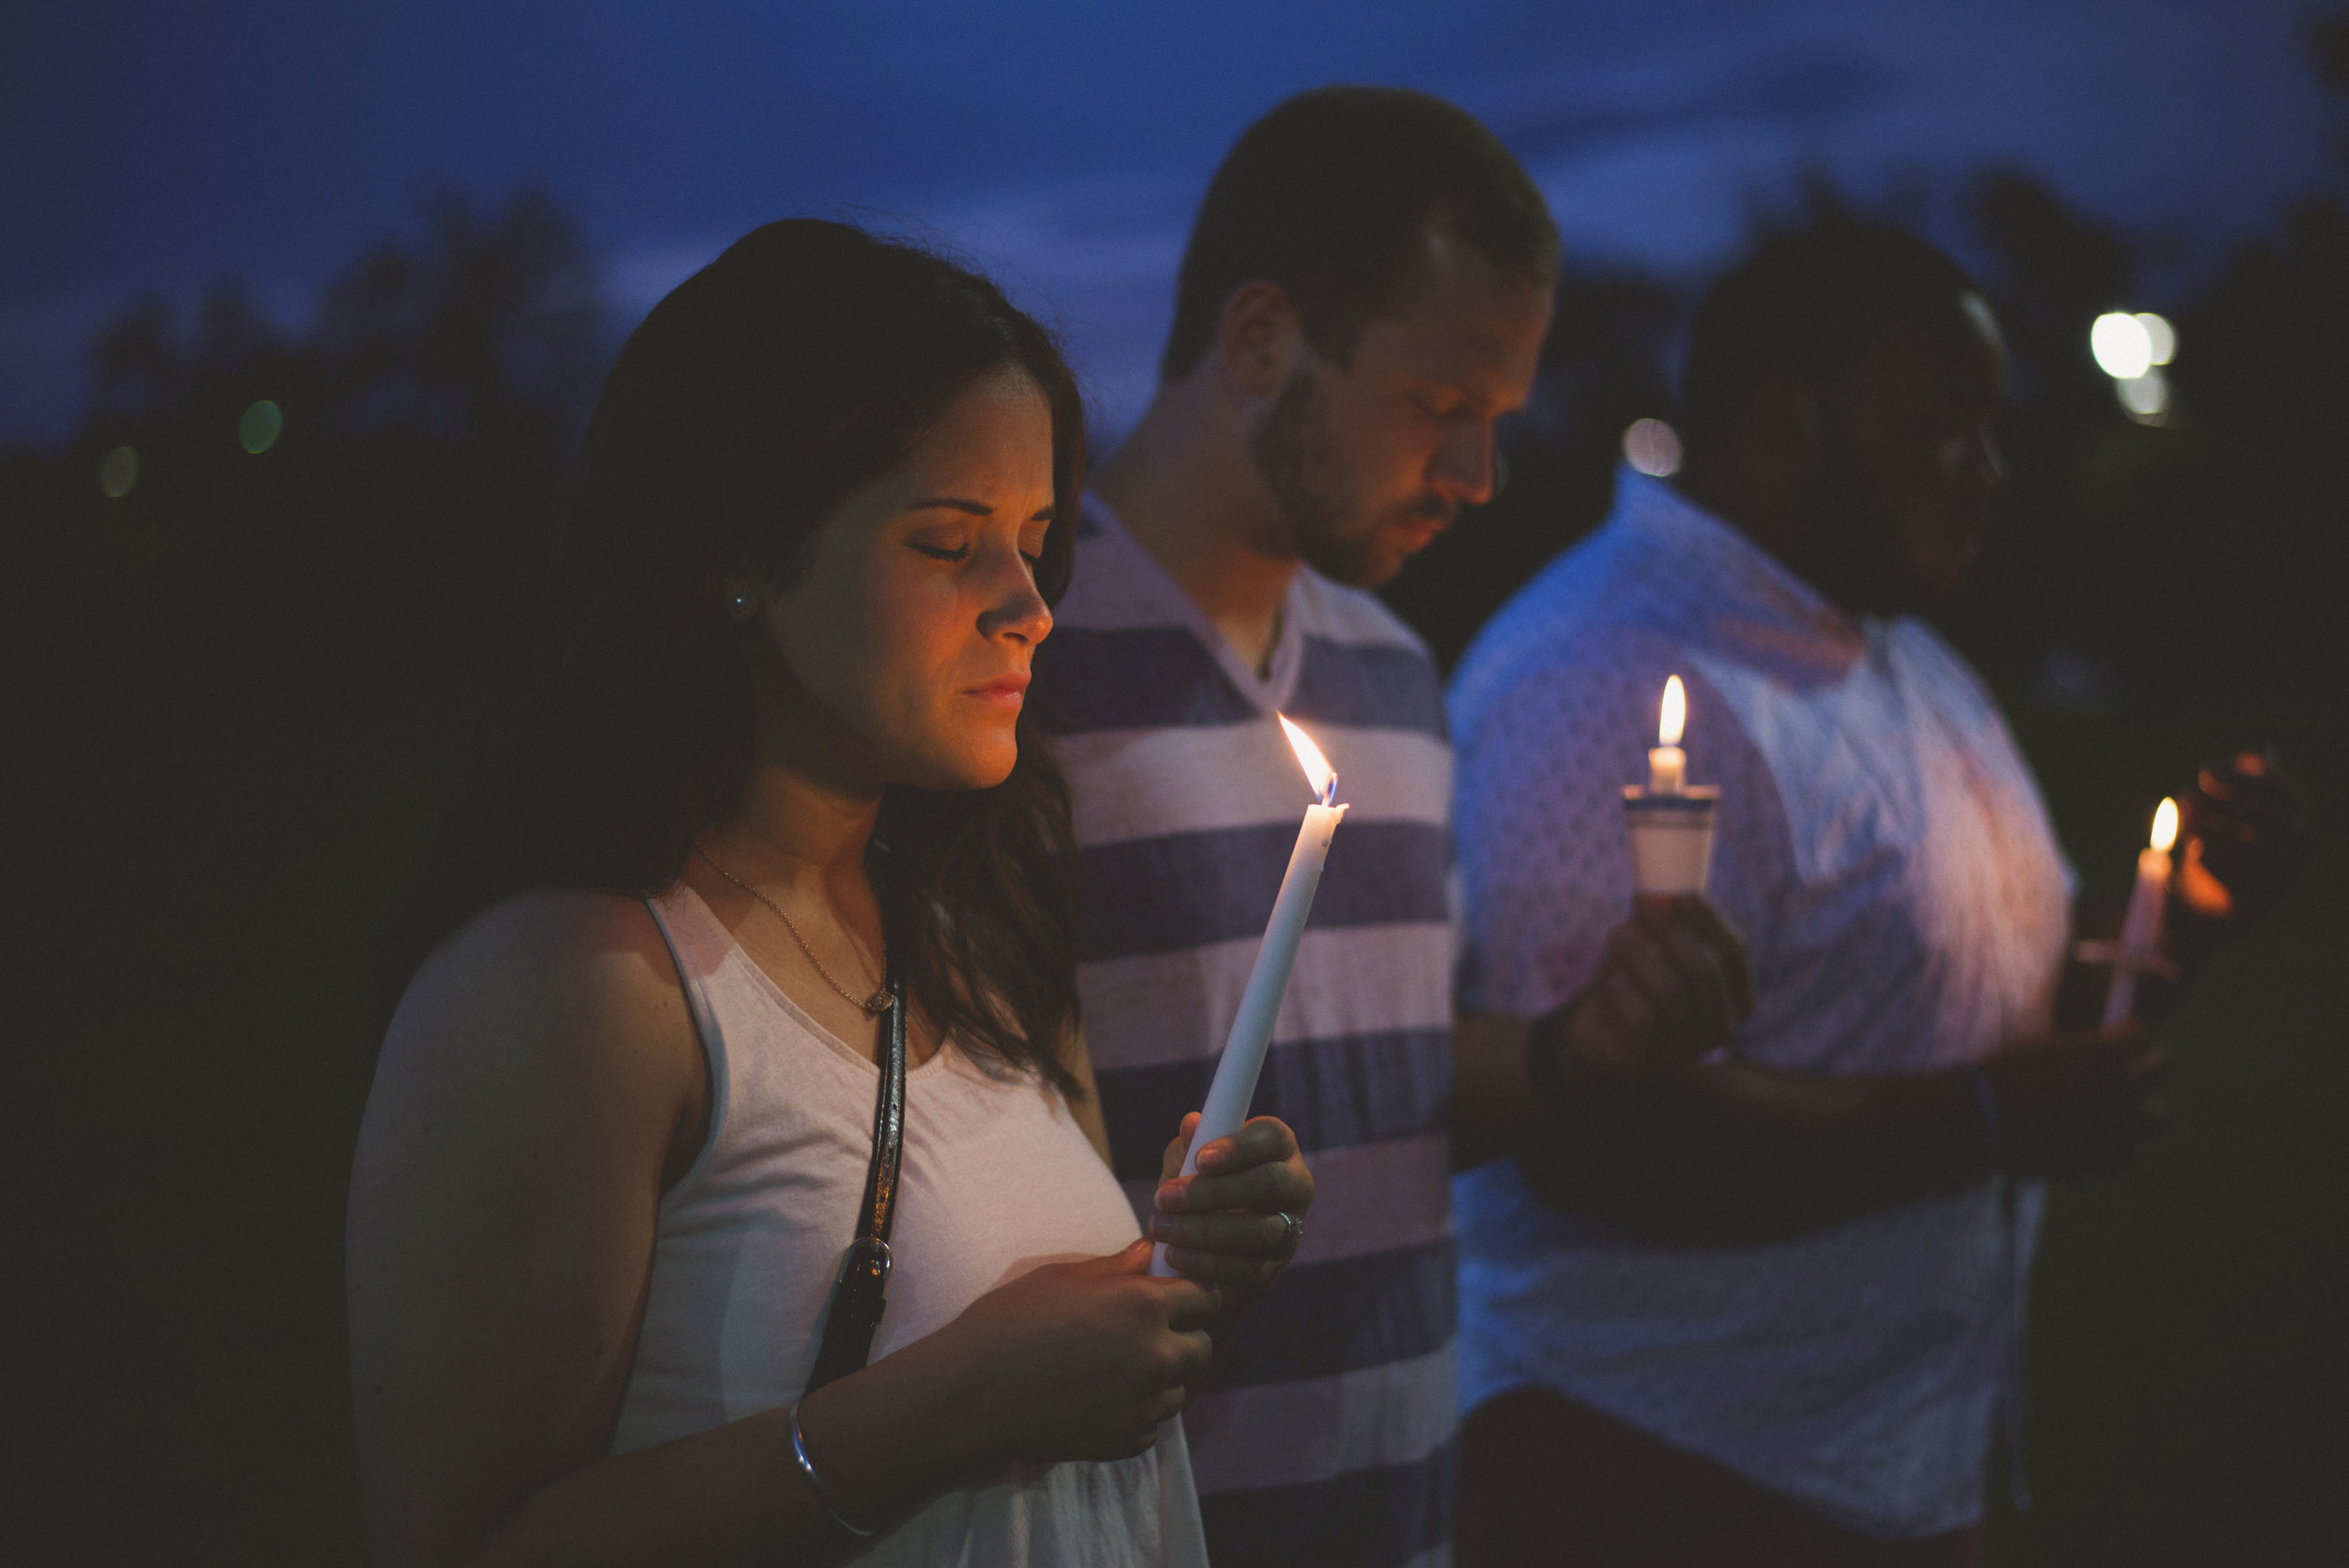 Candlelight Vigil for Matthew Gerald_Allie Appel_14.jpg